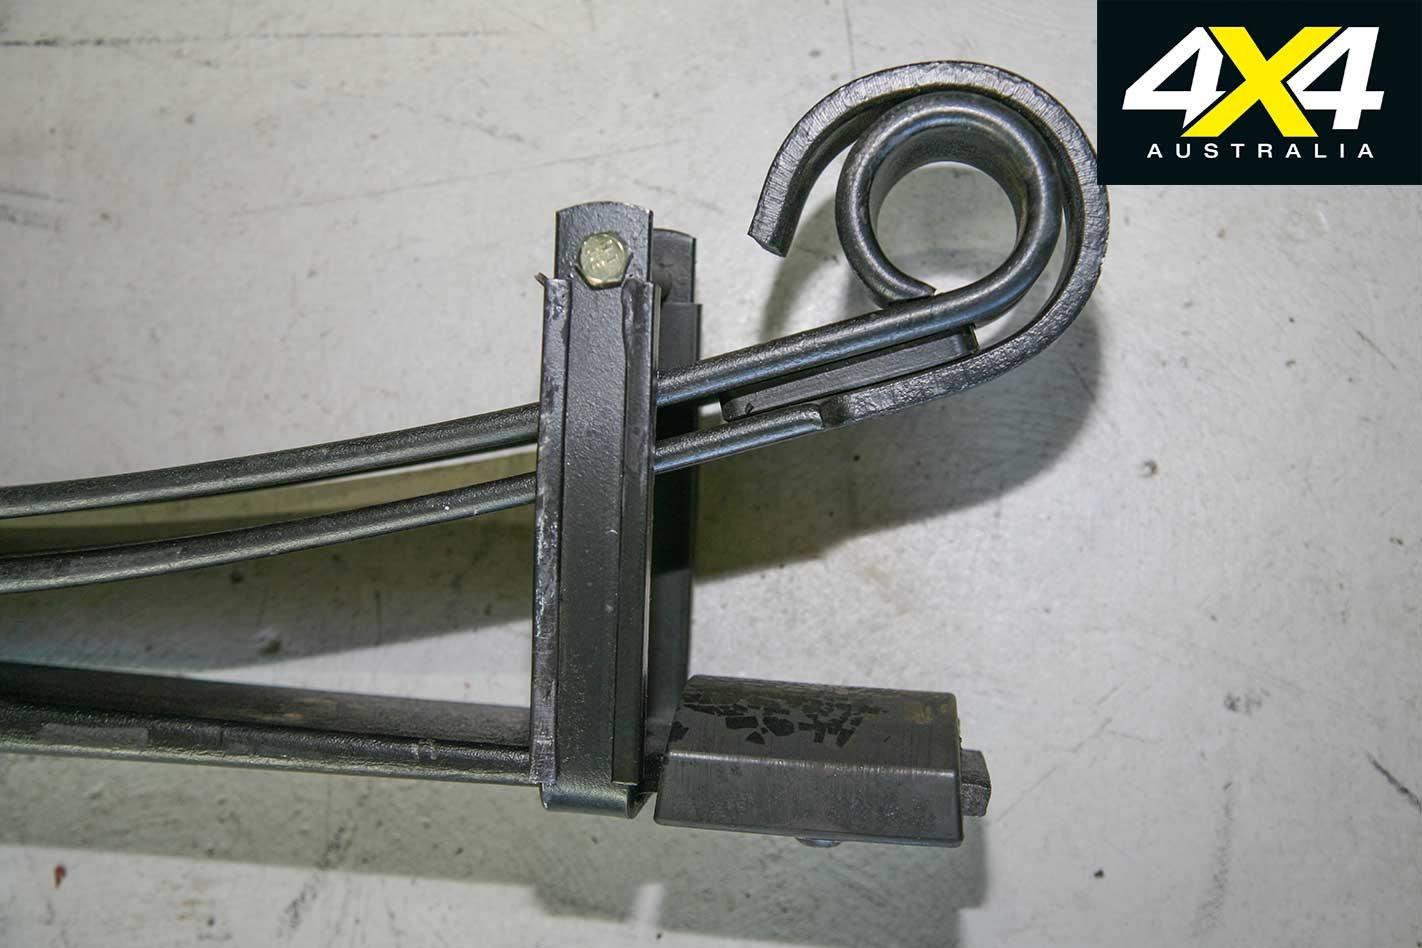 Terrain Tamer parabolic leaf springs product review | 4x4 Australia